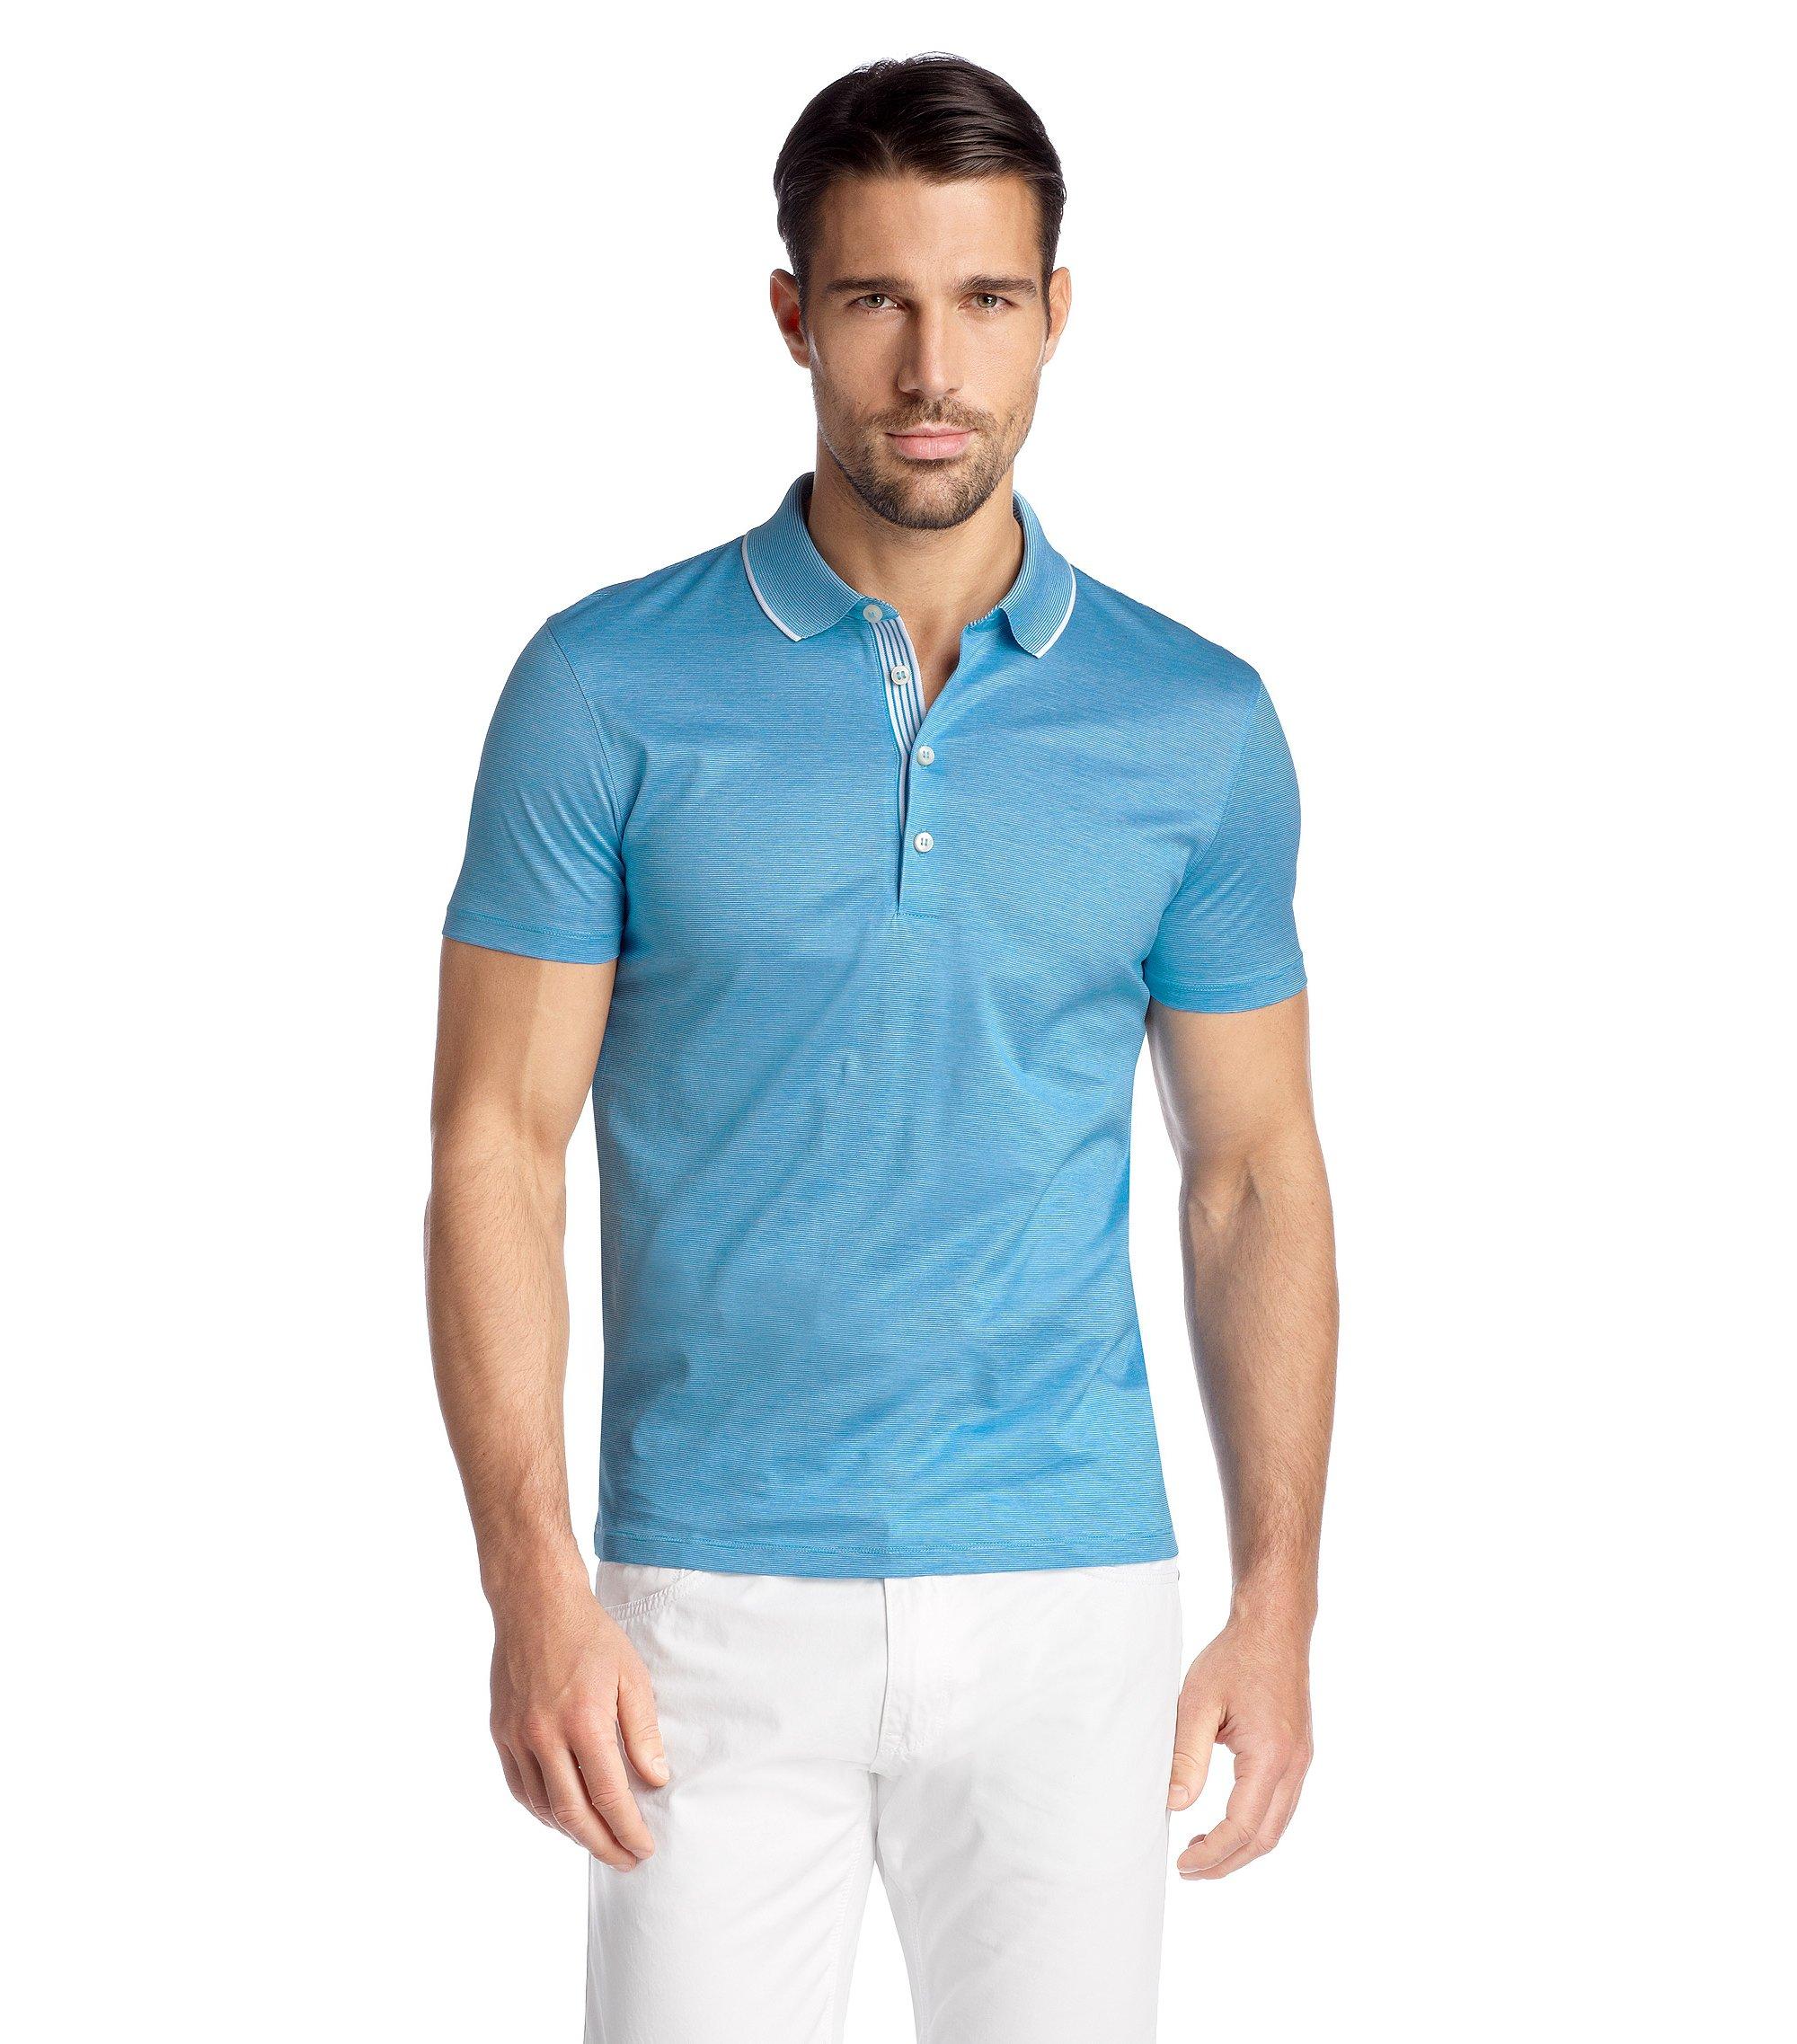 Regular Fit cotton polo shirt 'Bugnara 20', Light Blue